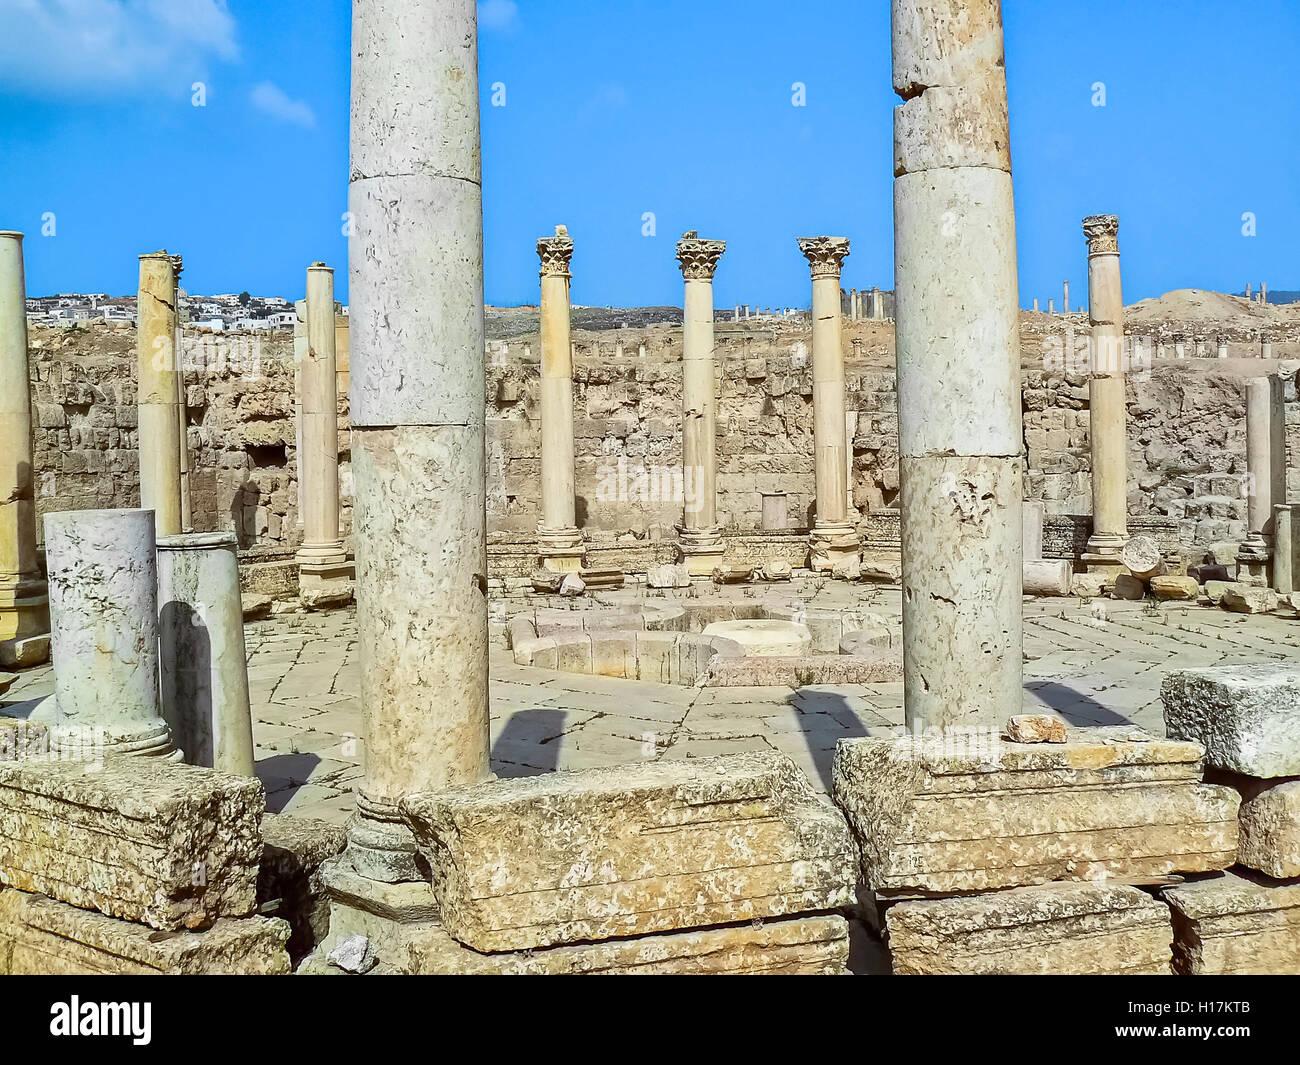 Roman temples at Jerash, Jordan - Stock Image